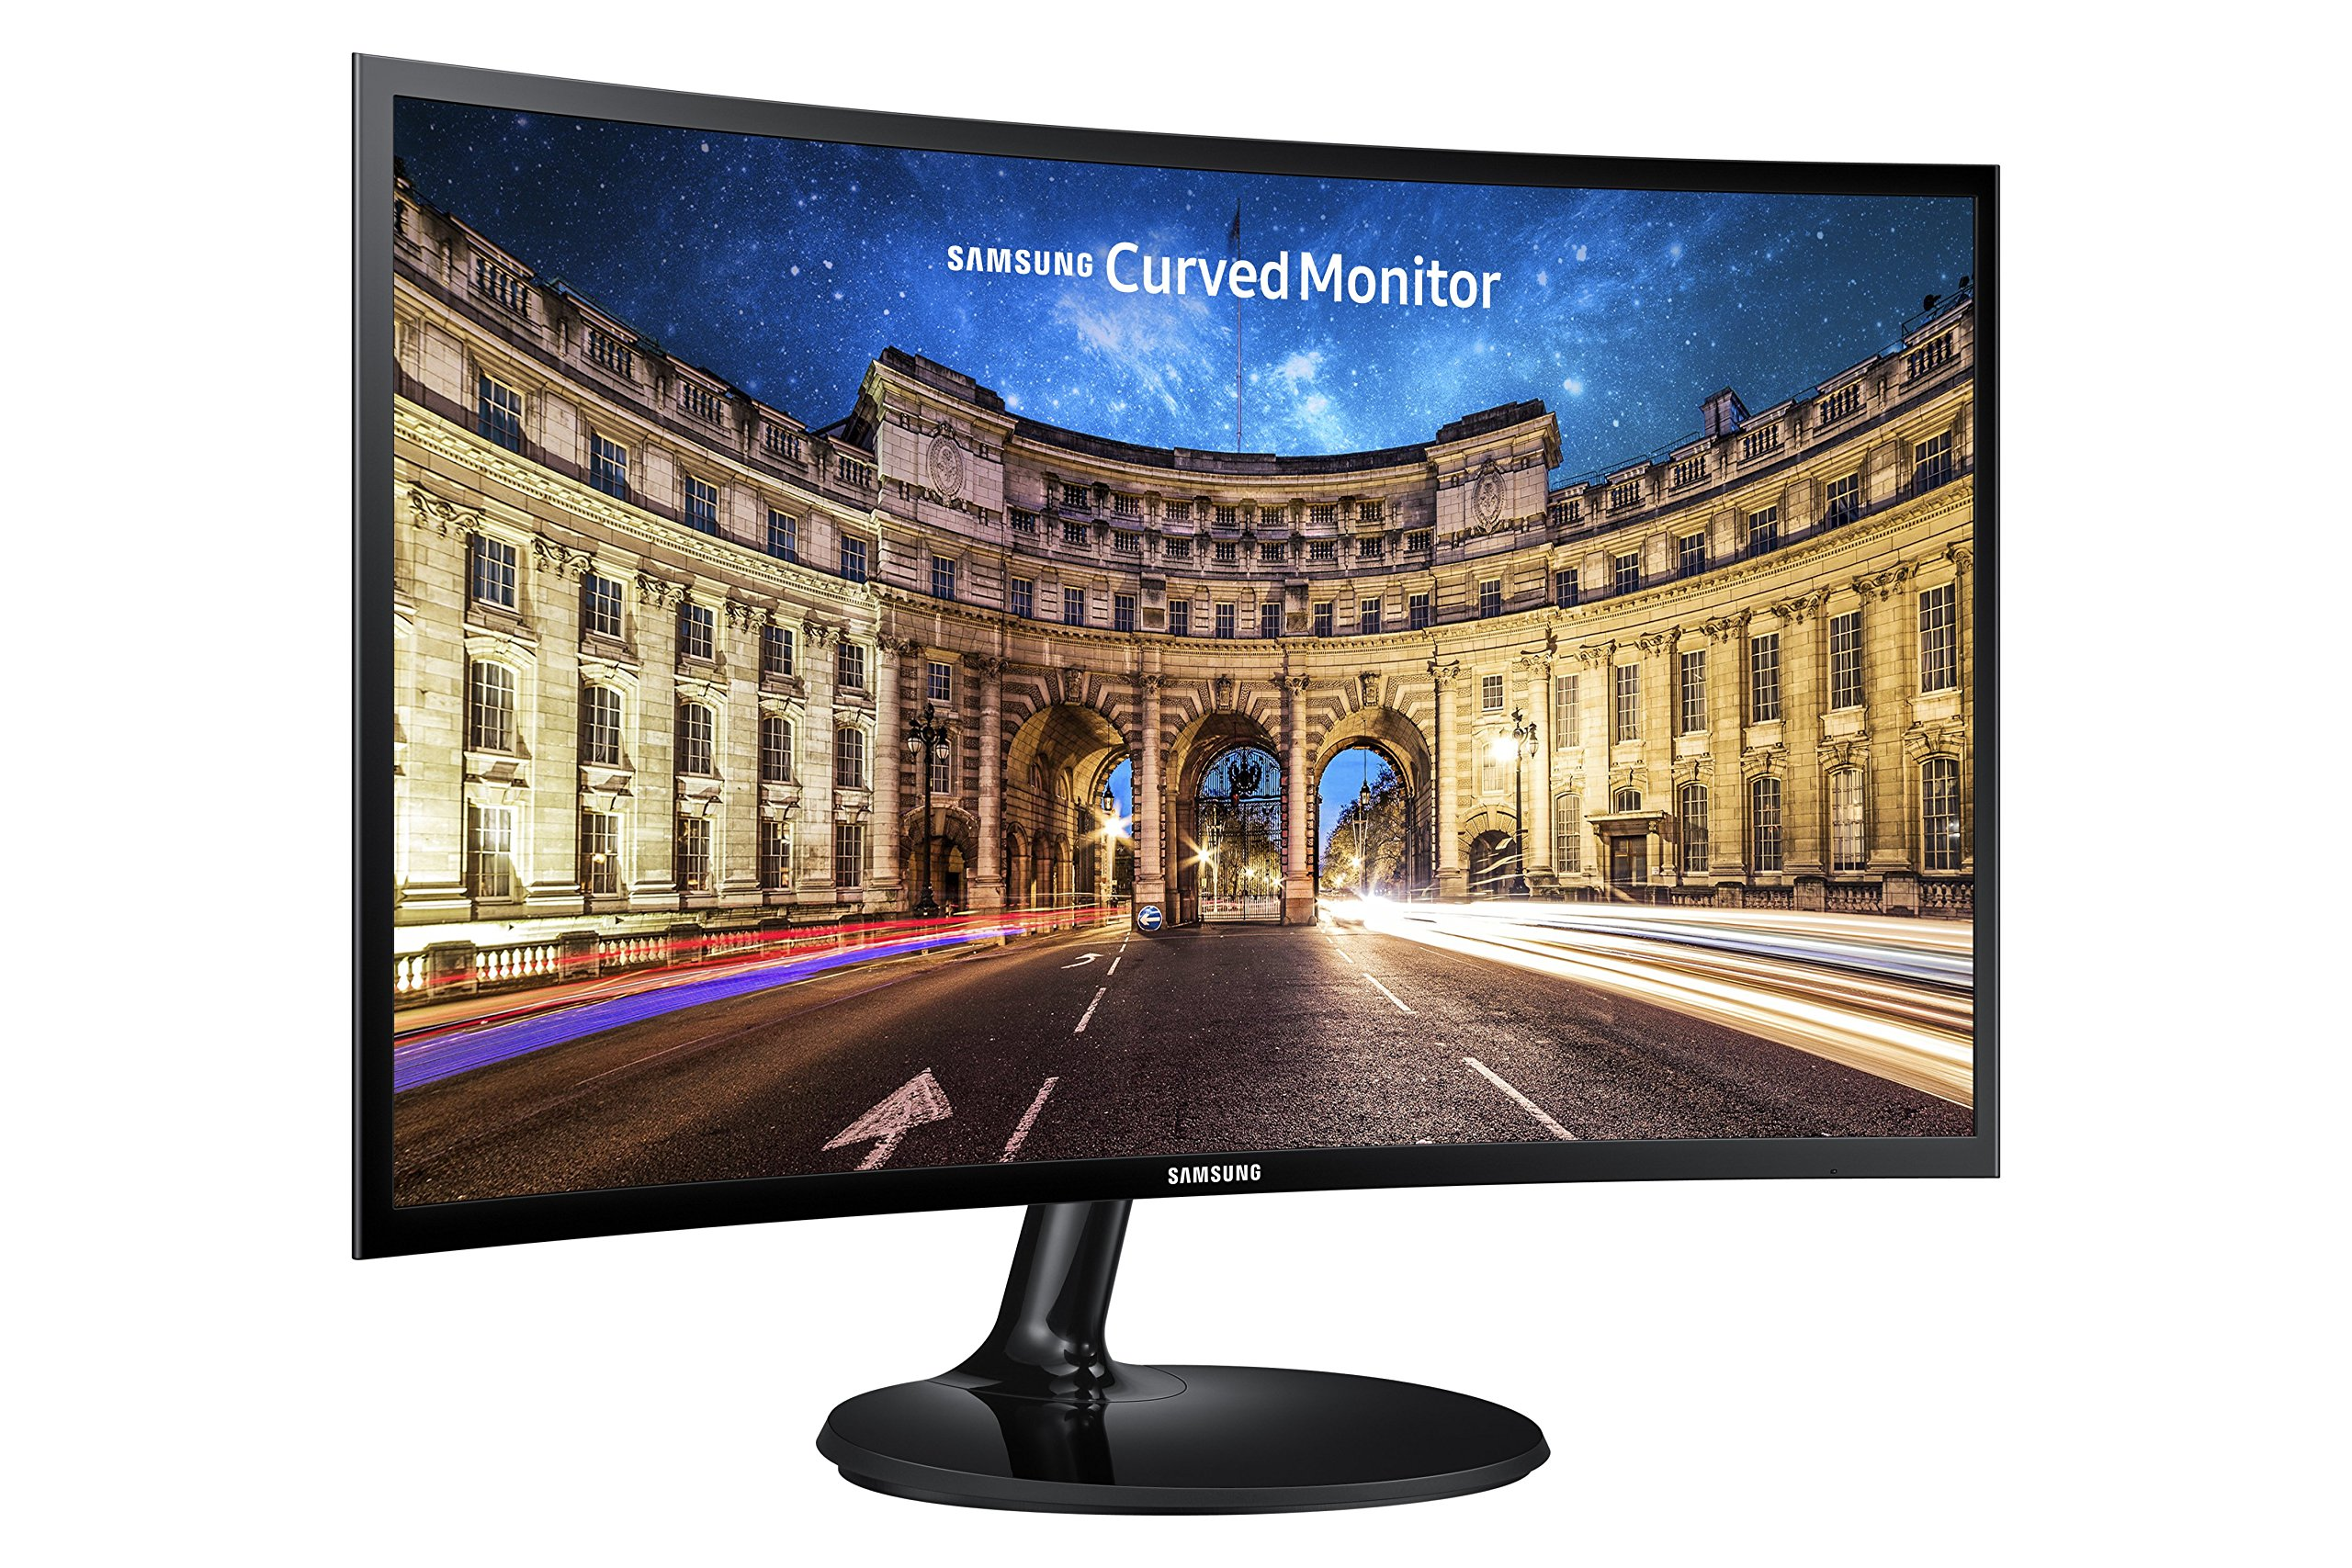 Samsung C24F390 24-Inch Curved Monitor (Super Slim Design) by Samsung